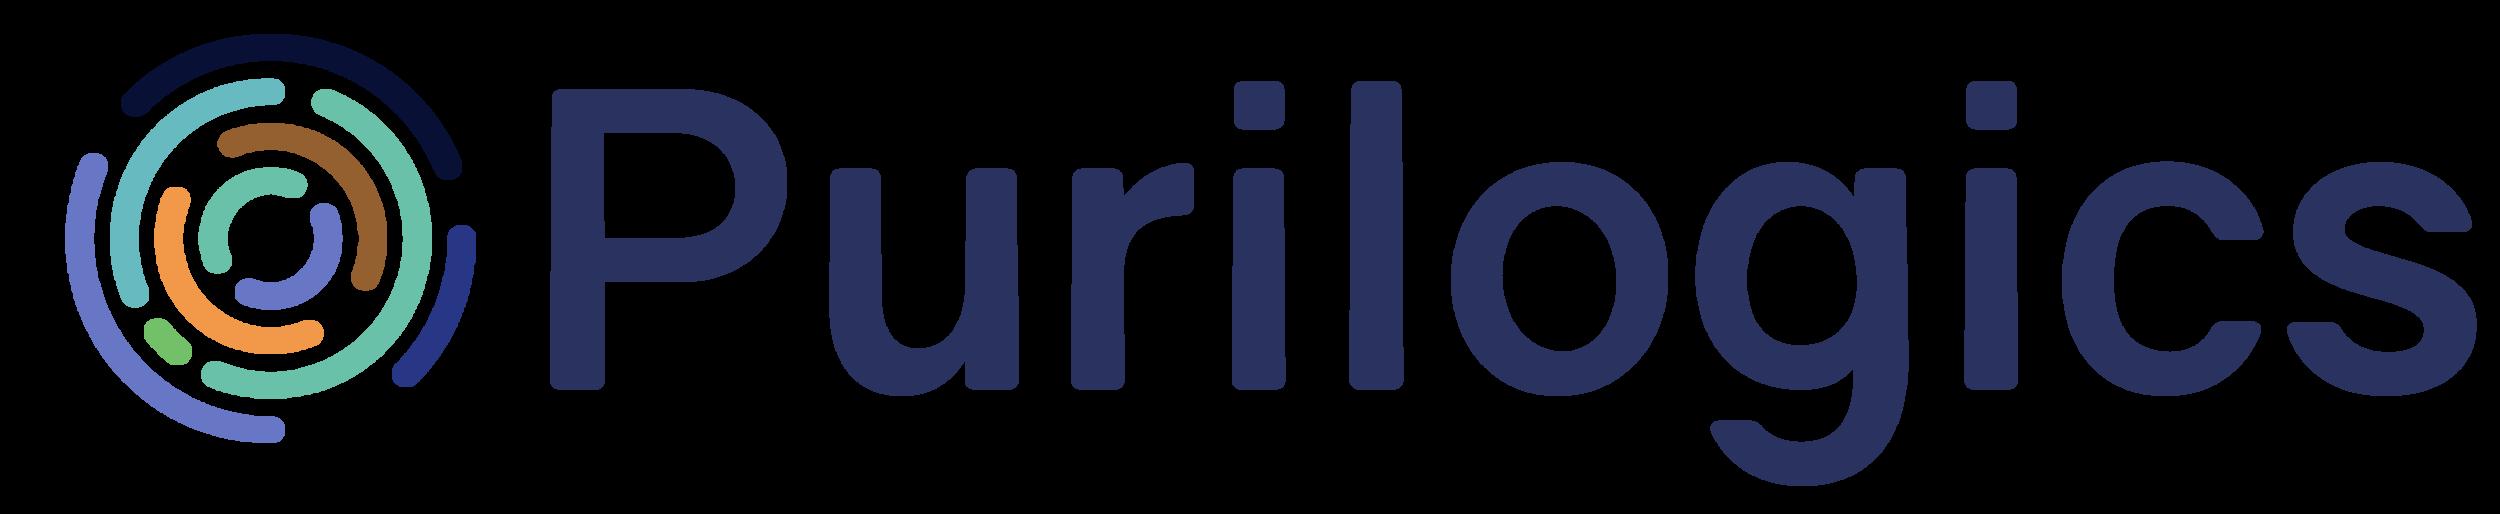 purilogics logo.png